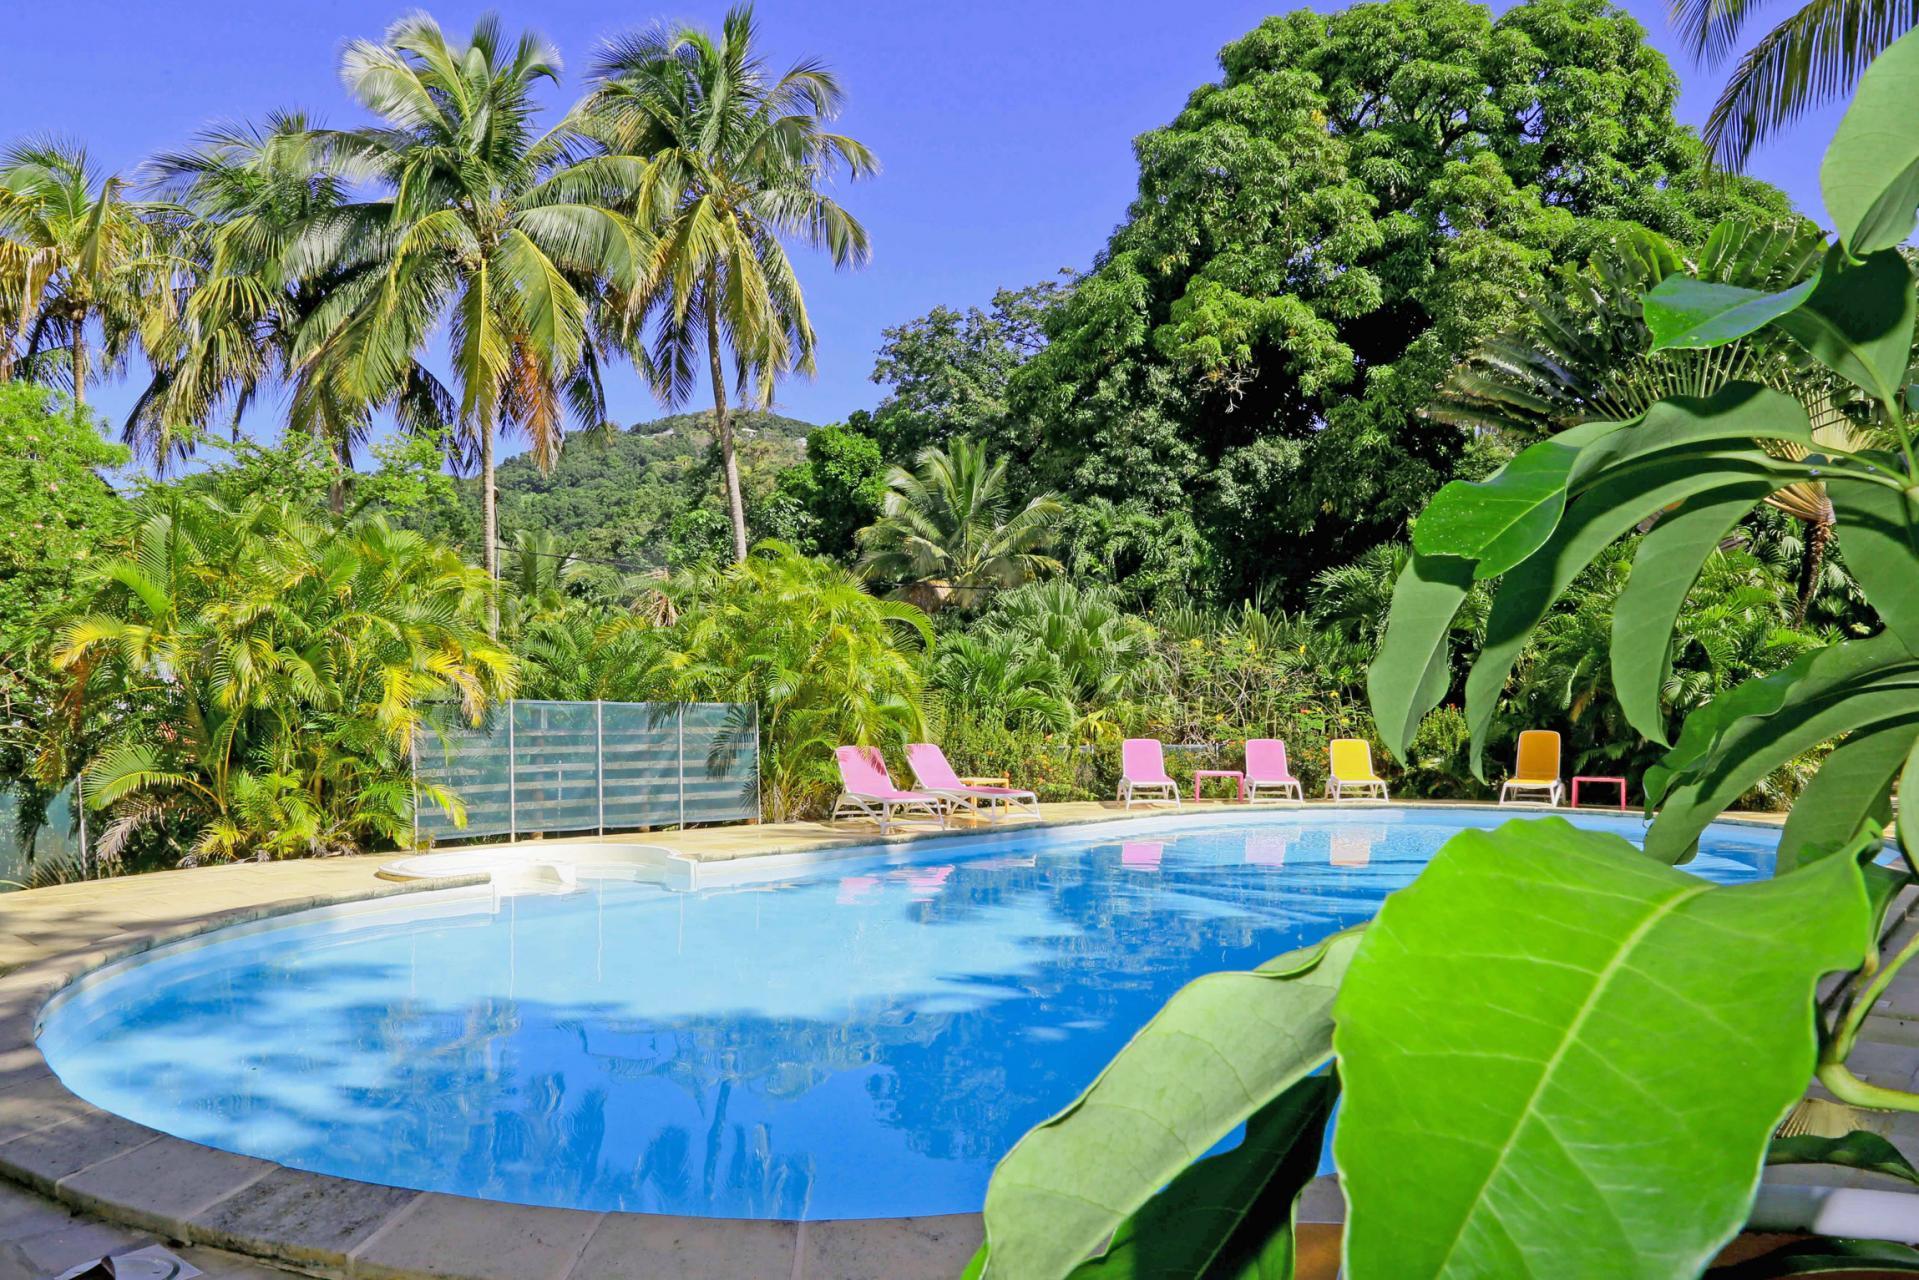 Photo Caraïb' Bay Hotel - Hotel de charme Guadeloupe - Piscine